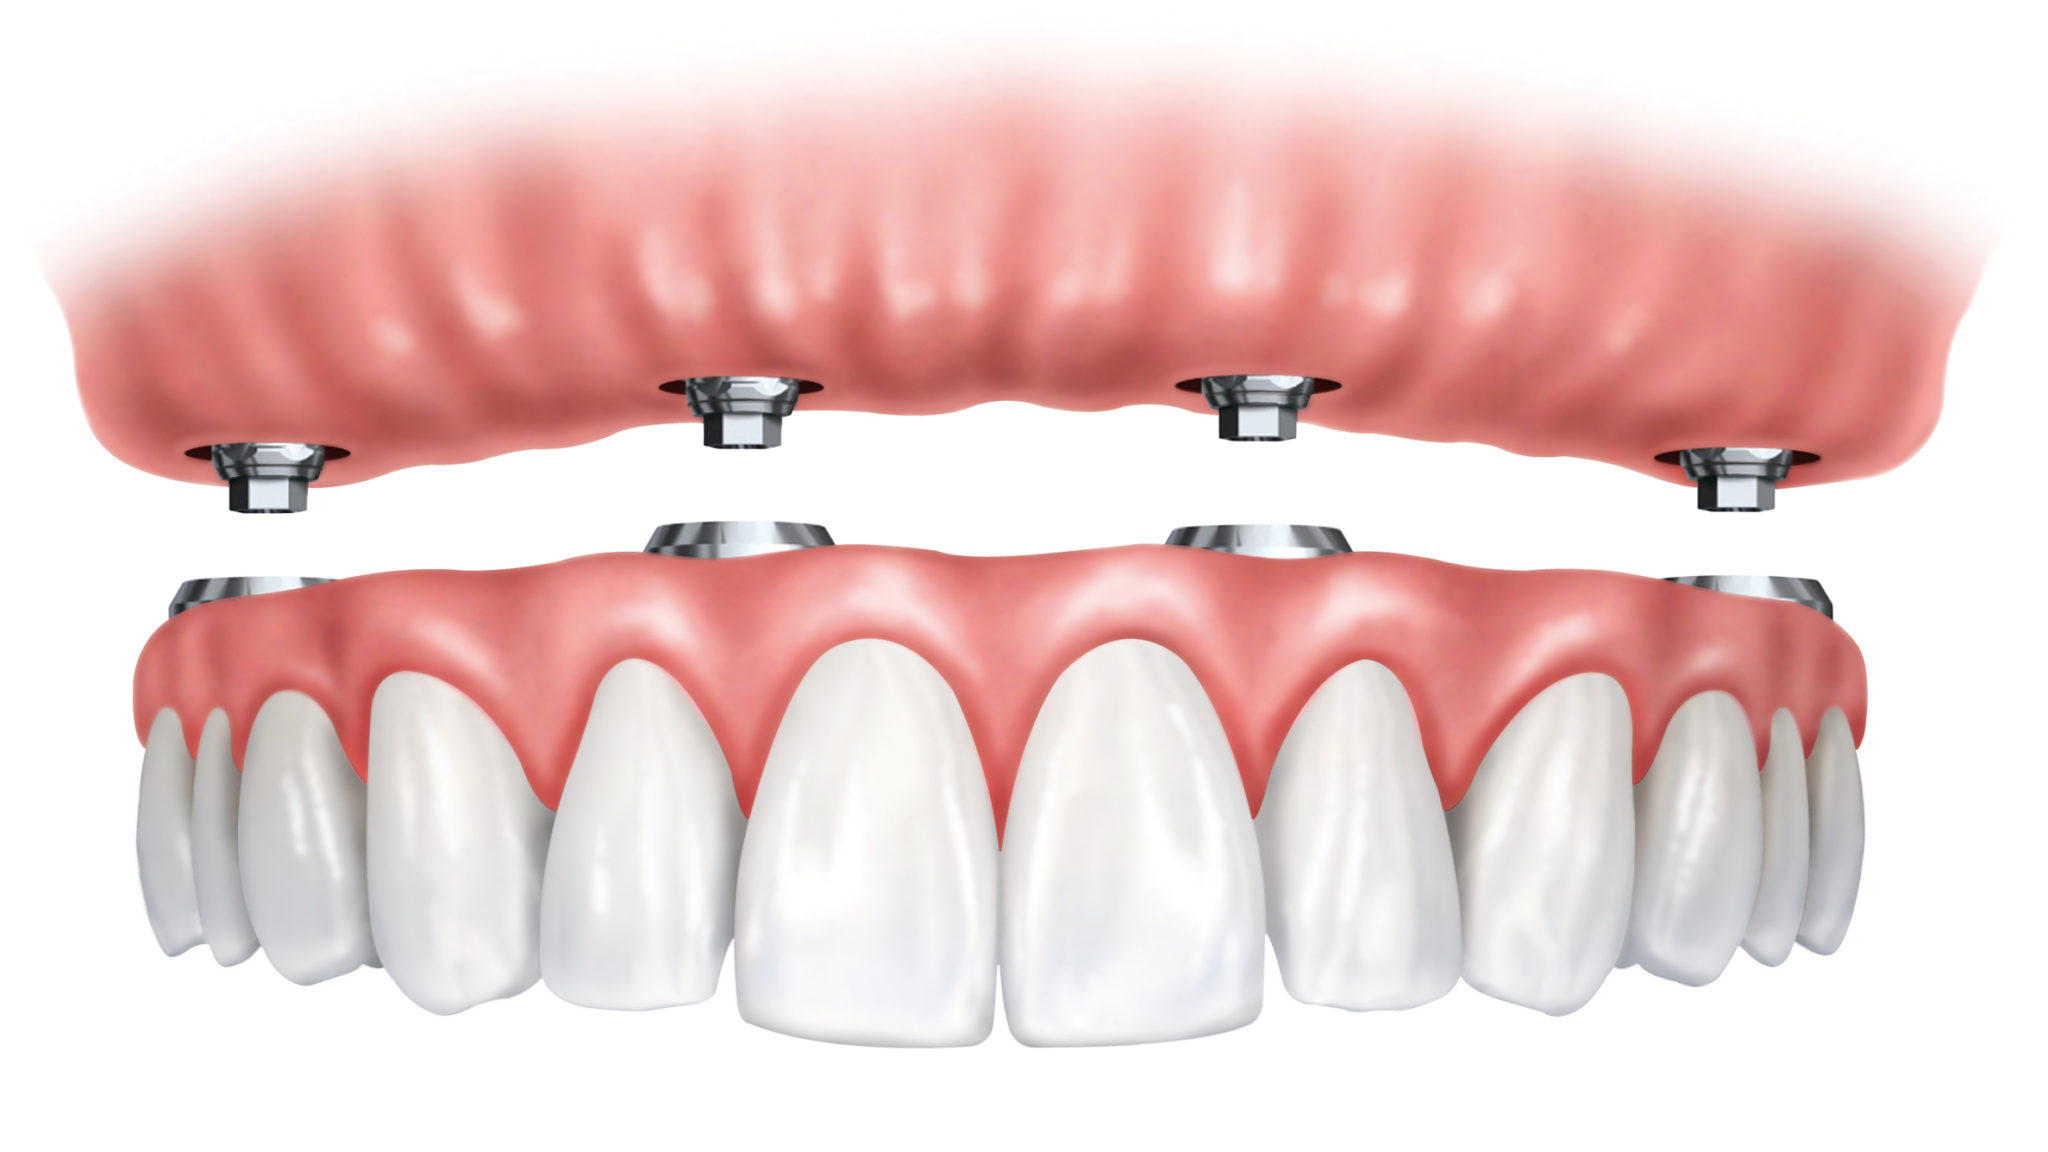 implant-dentures.jpg